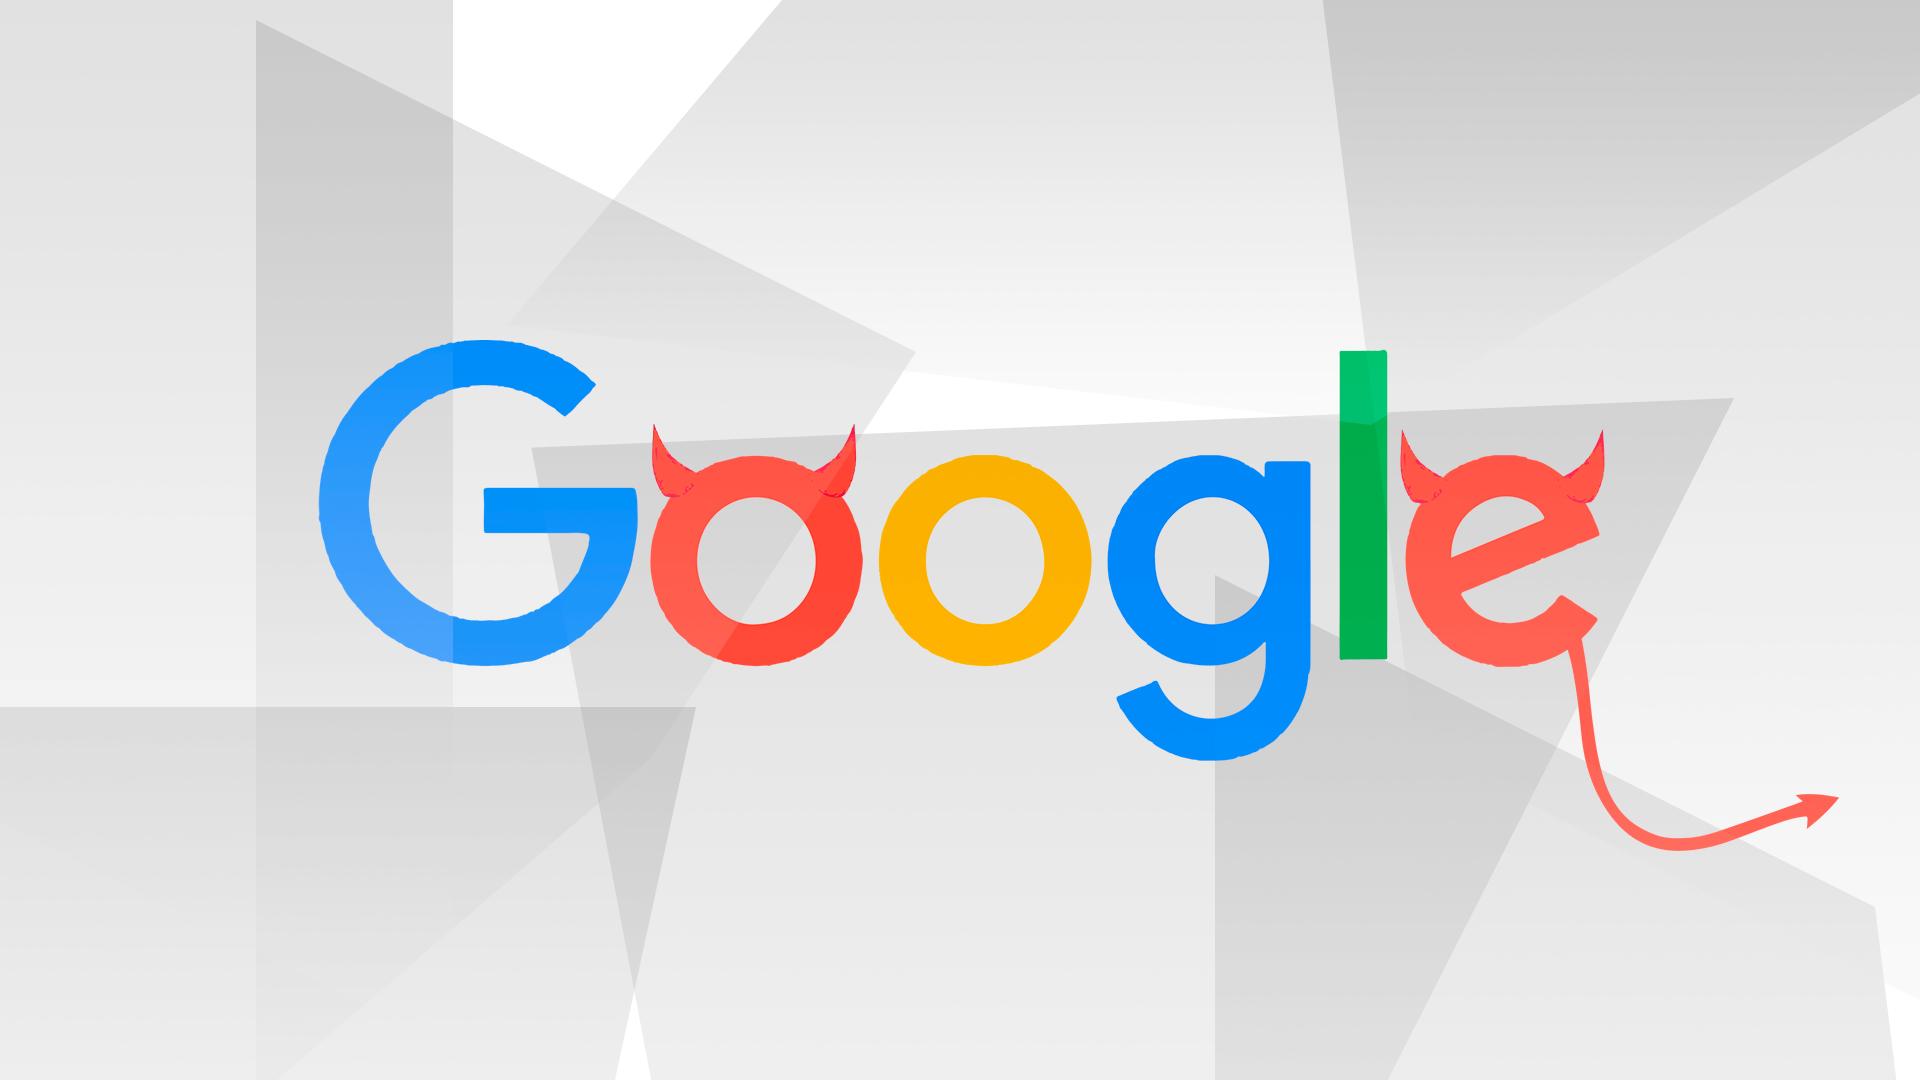 Google, Suchmaschine, Google Logo, Do No Evil, Google Evil, Böses Google